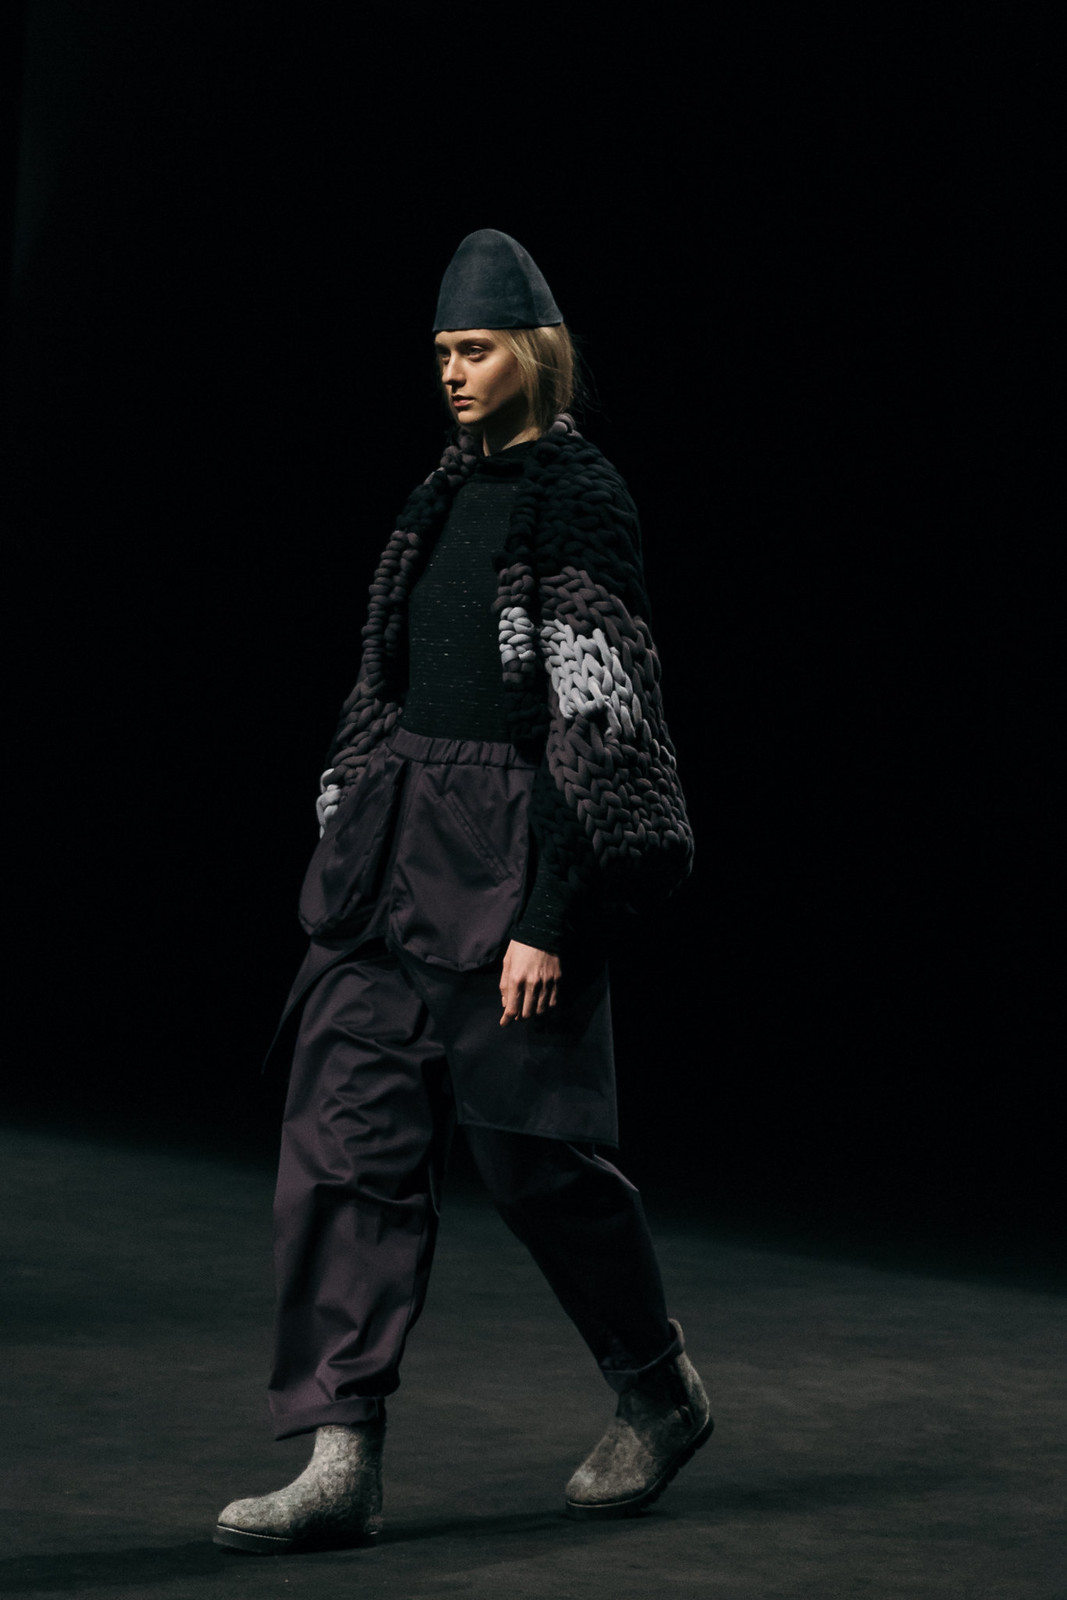 Jessie Chanes - Seams for a desire - 080 Bacelona Fashion #080bcnfasion -29